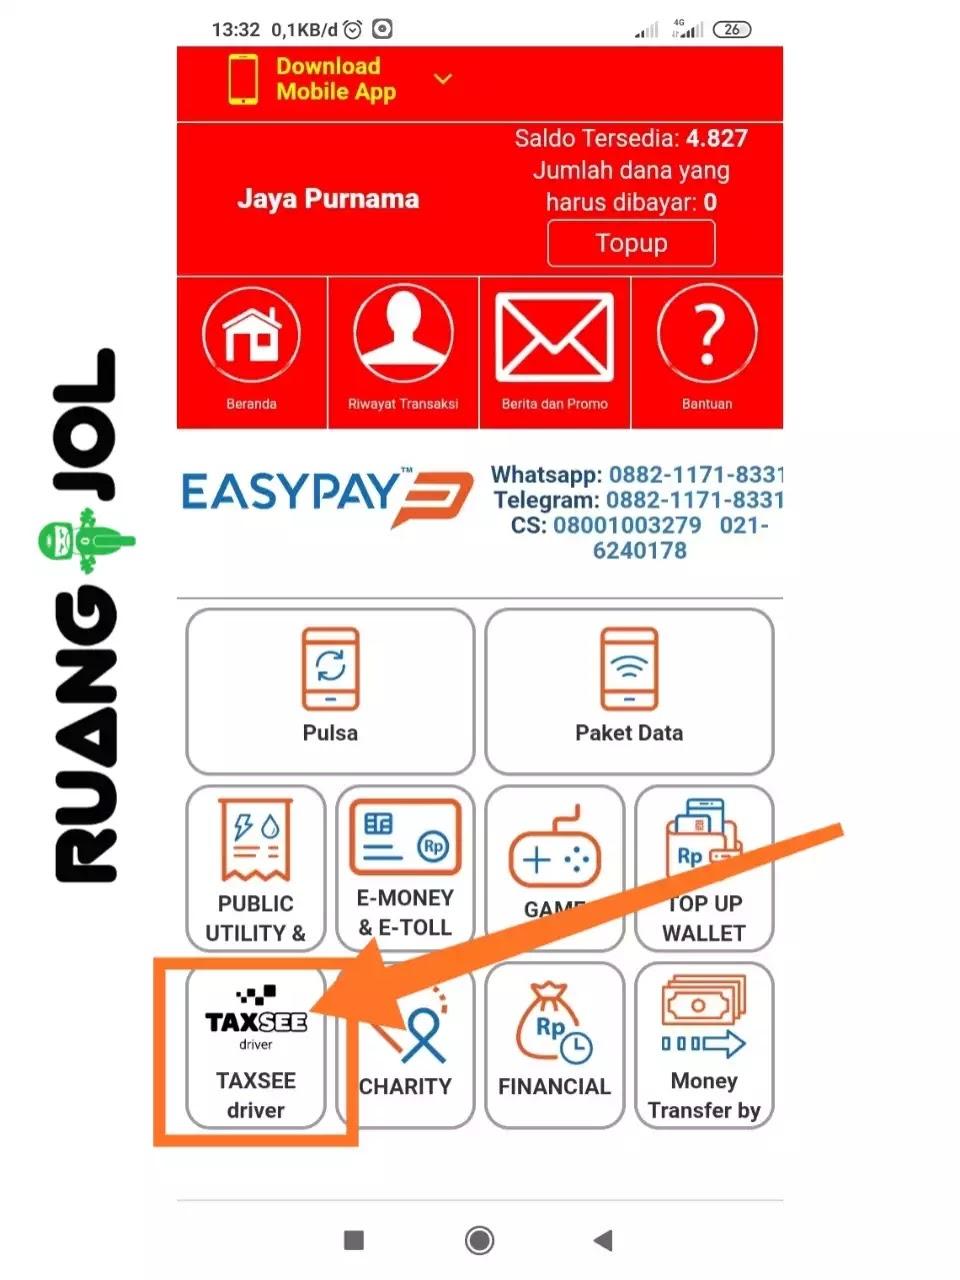 Cara Daftar Akun Easypay Web Pos Indonesia